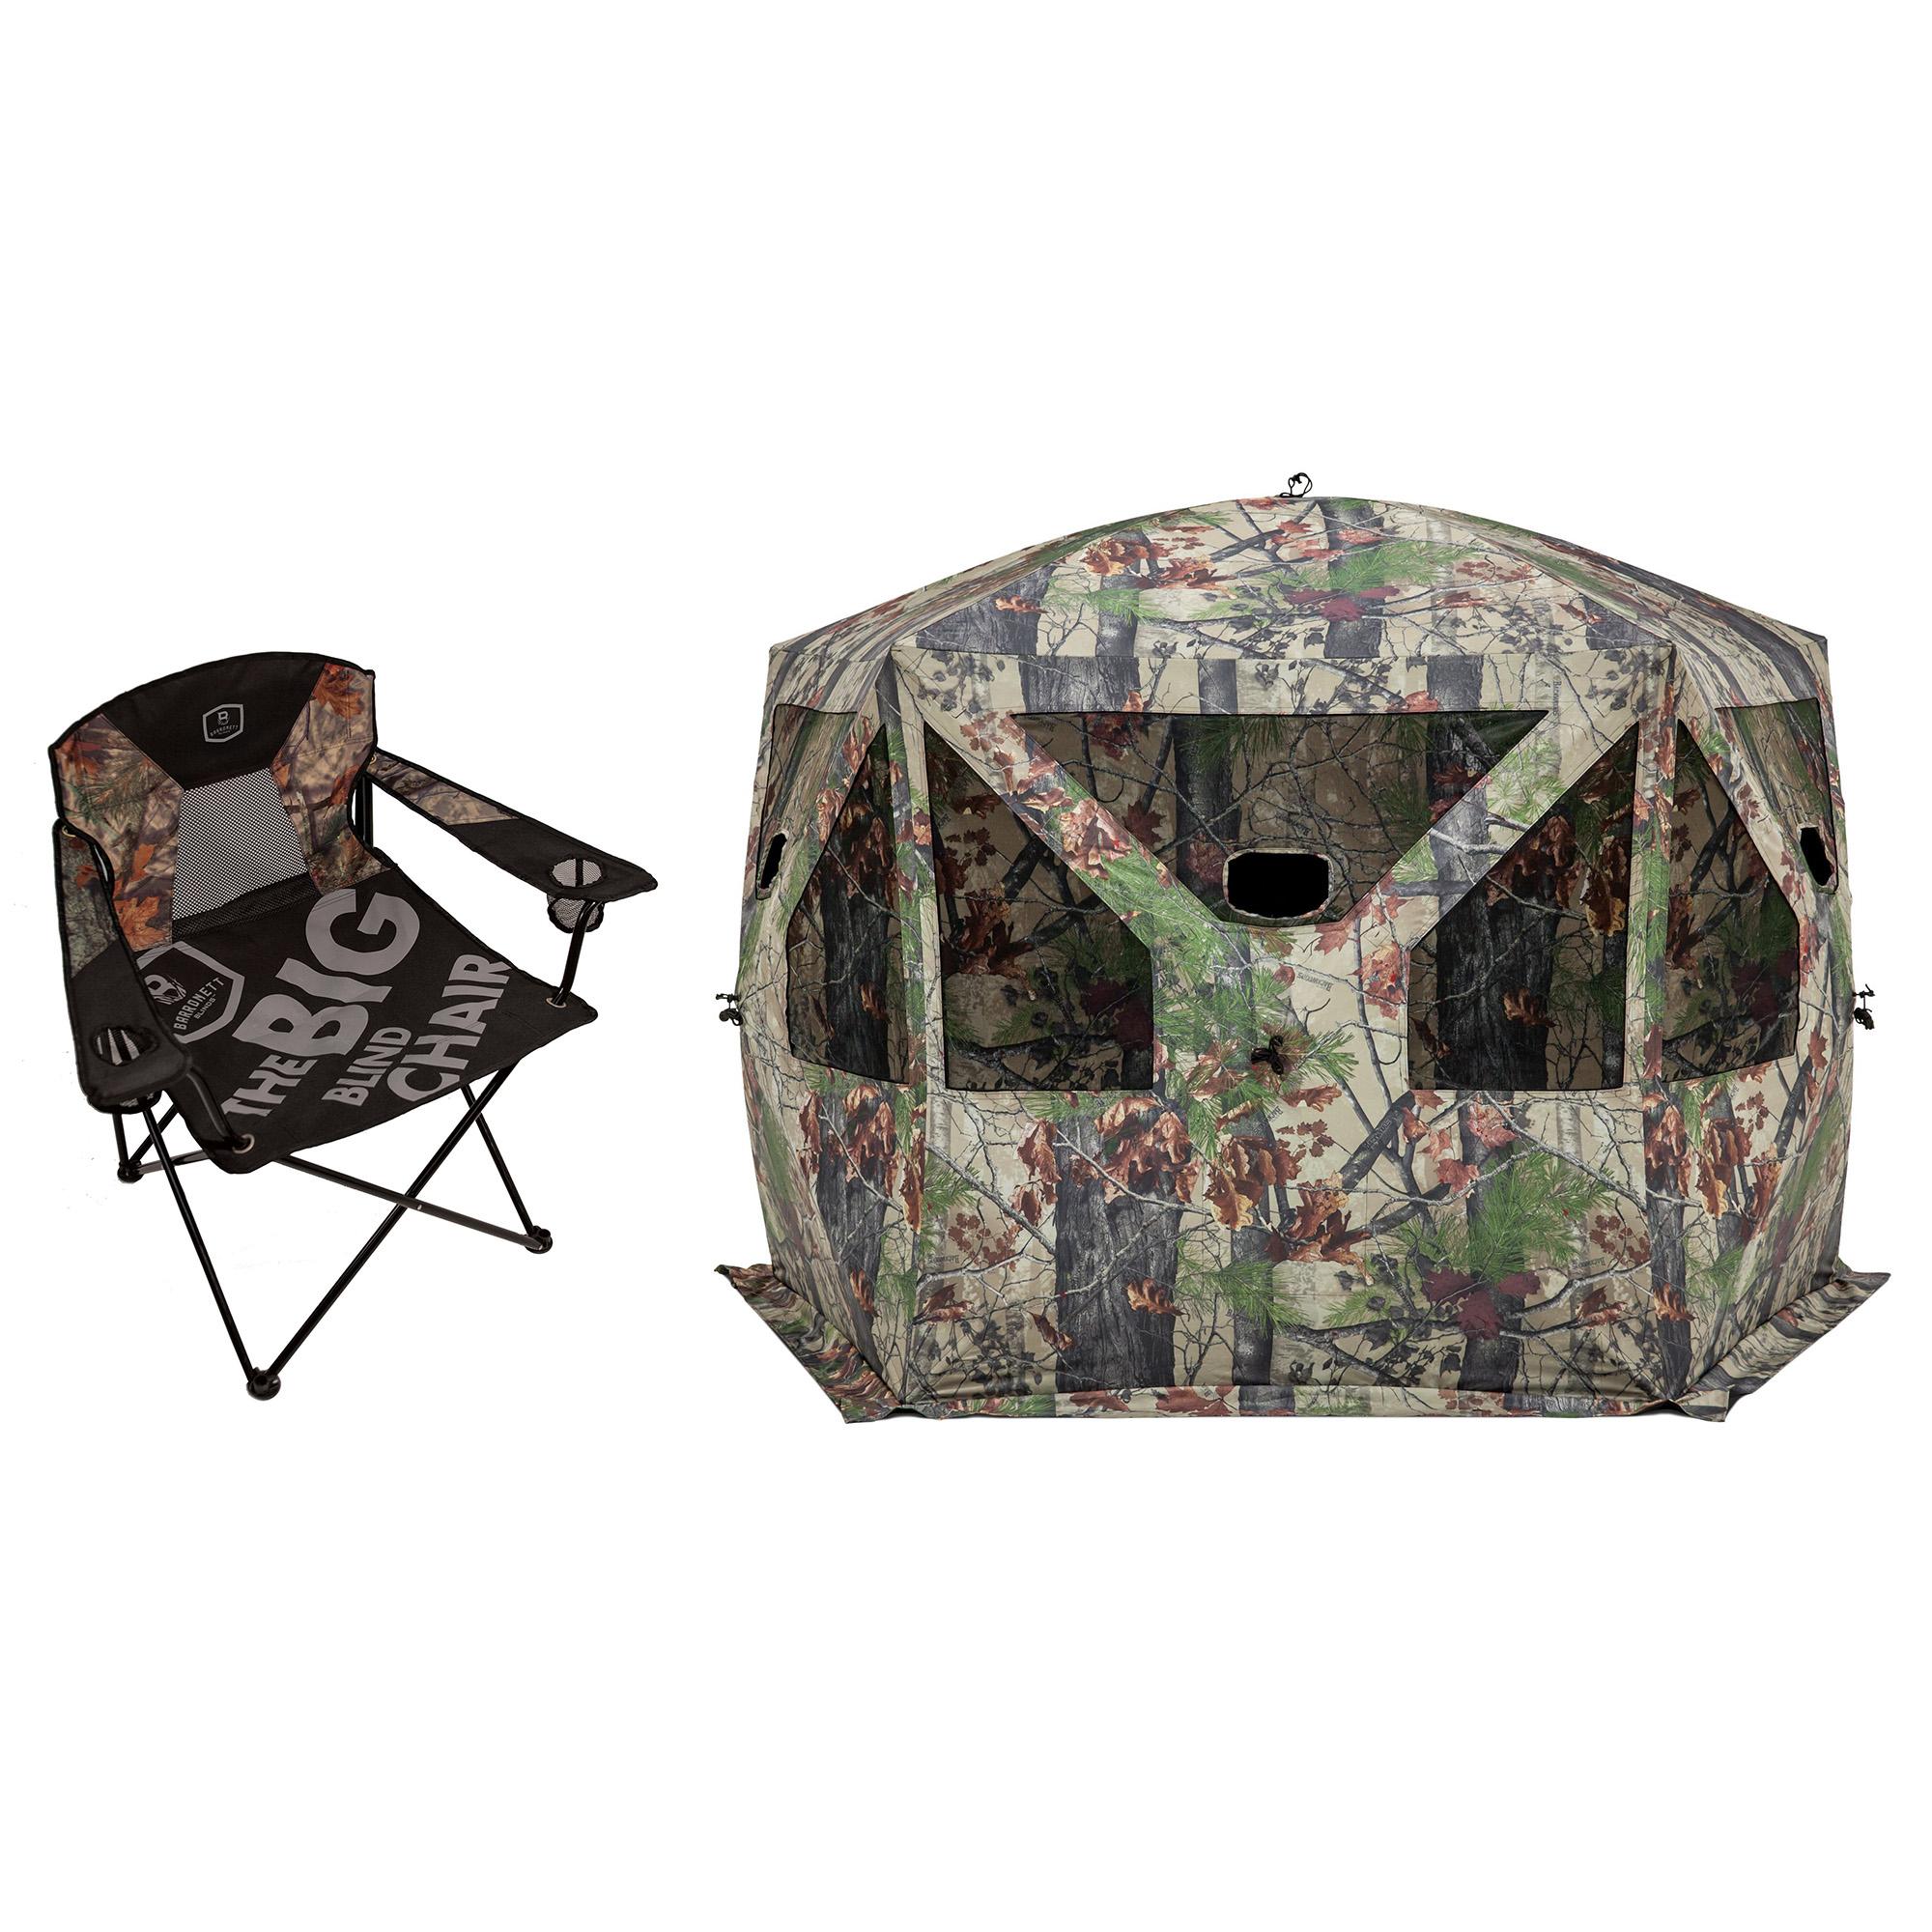 Barronett Blinds Big Blind Folding Chair + Bloodtrail Backwoods Hunting Blind  sc 1 st  Walmart & Hunting Chairs